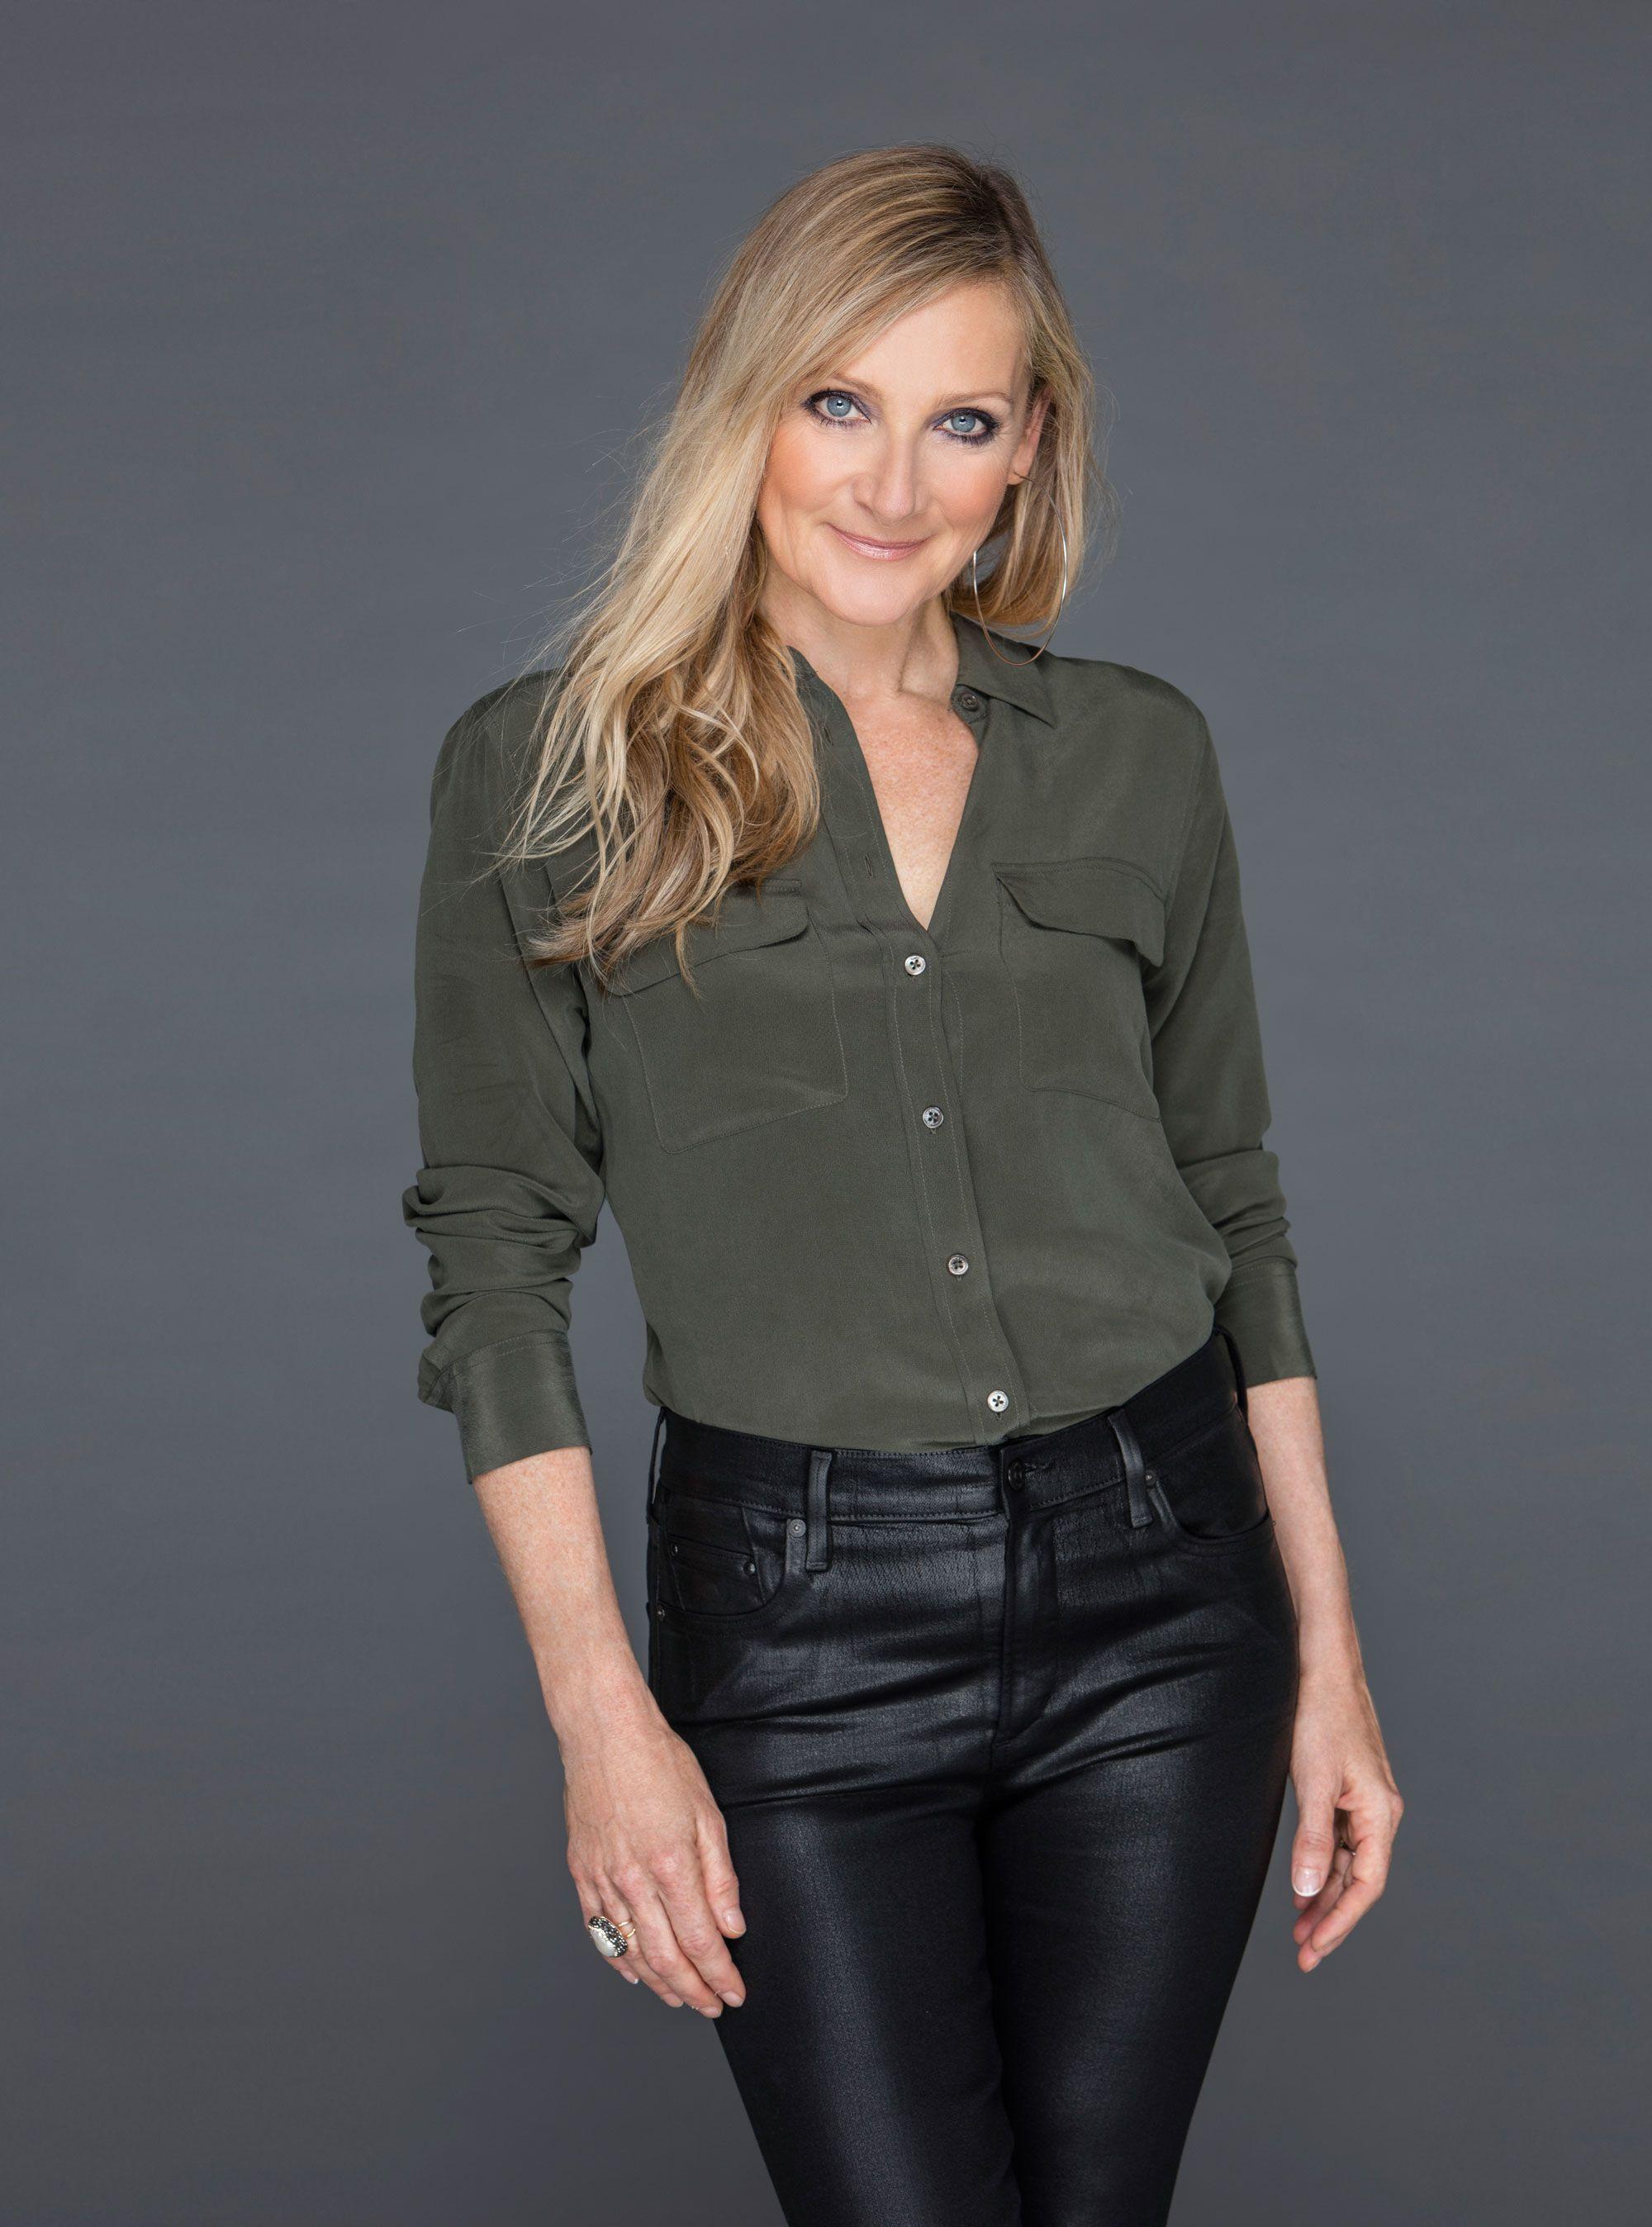 Soa Denise USA Hot clips Joey Lauren Adams,Gema Zamprogna